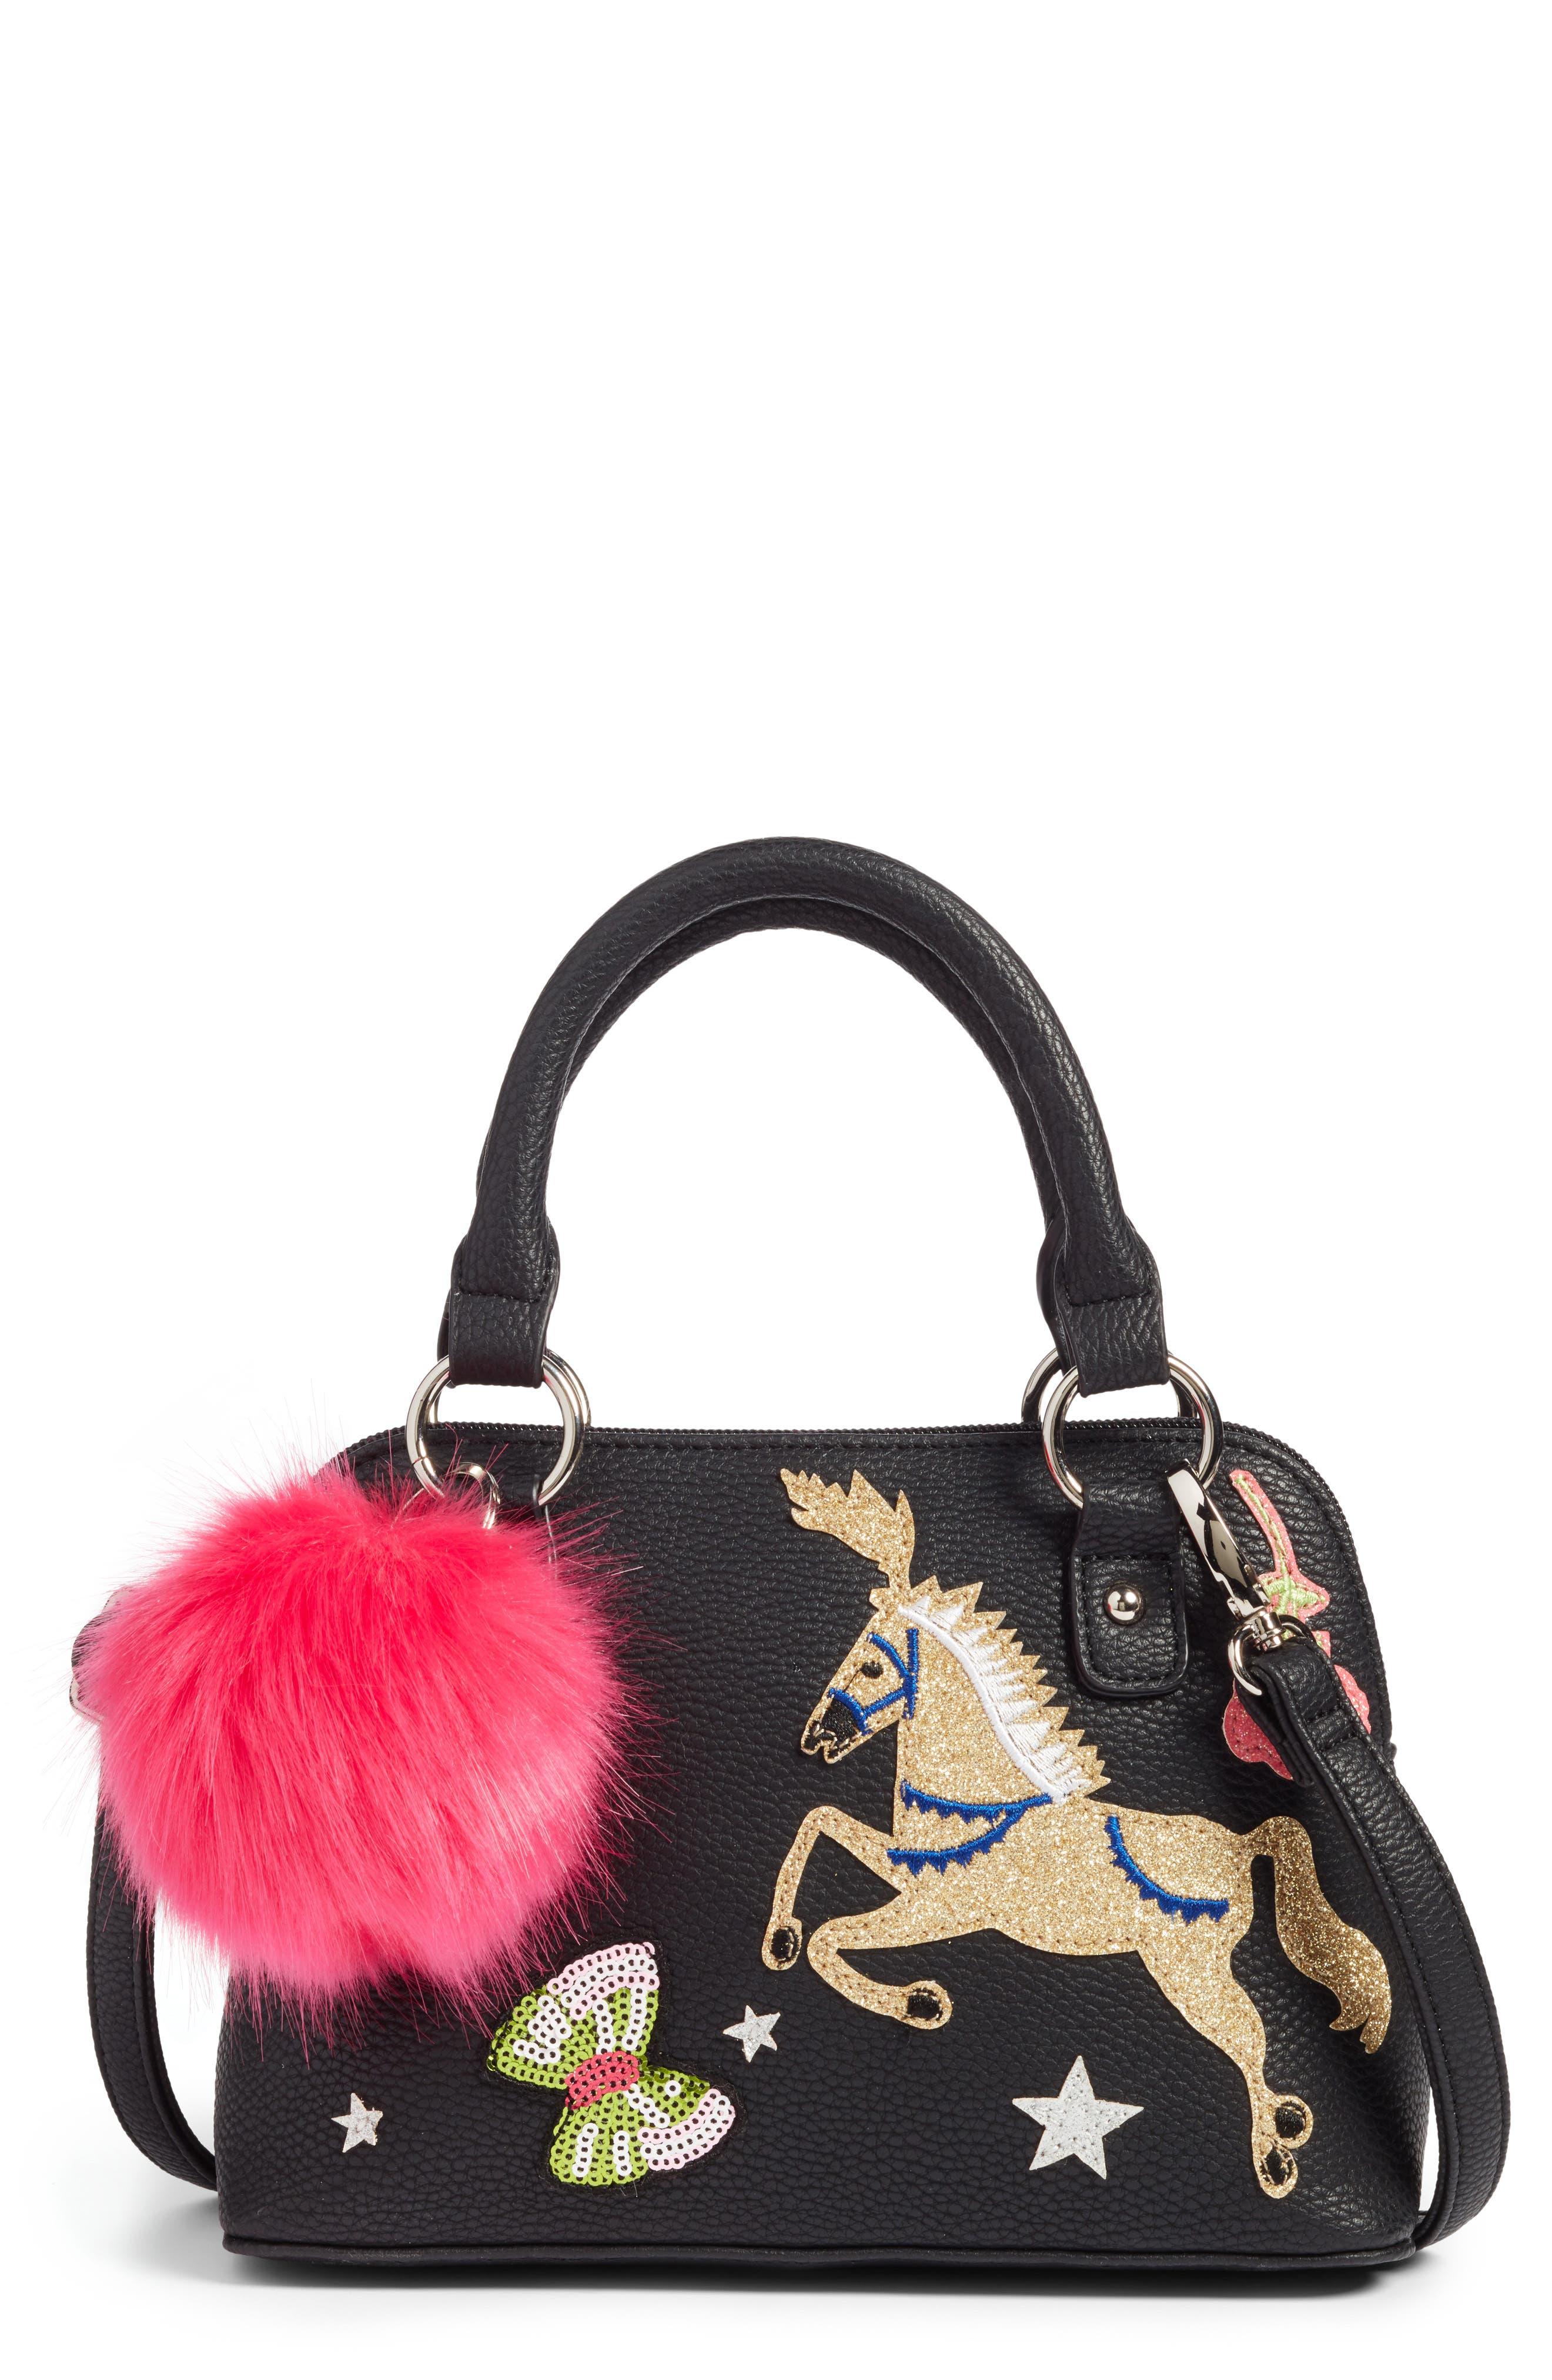 Appliqué Handbag,                             Main thumbnail 1, color,                             006